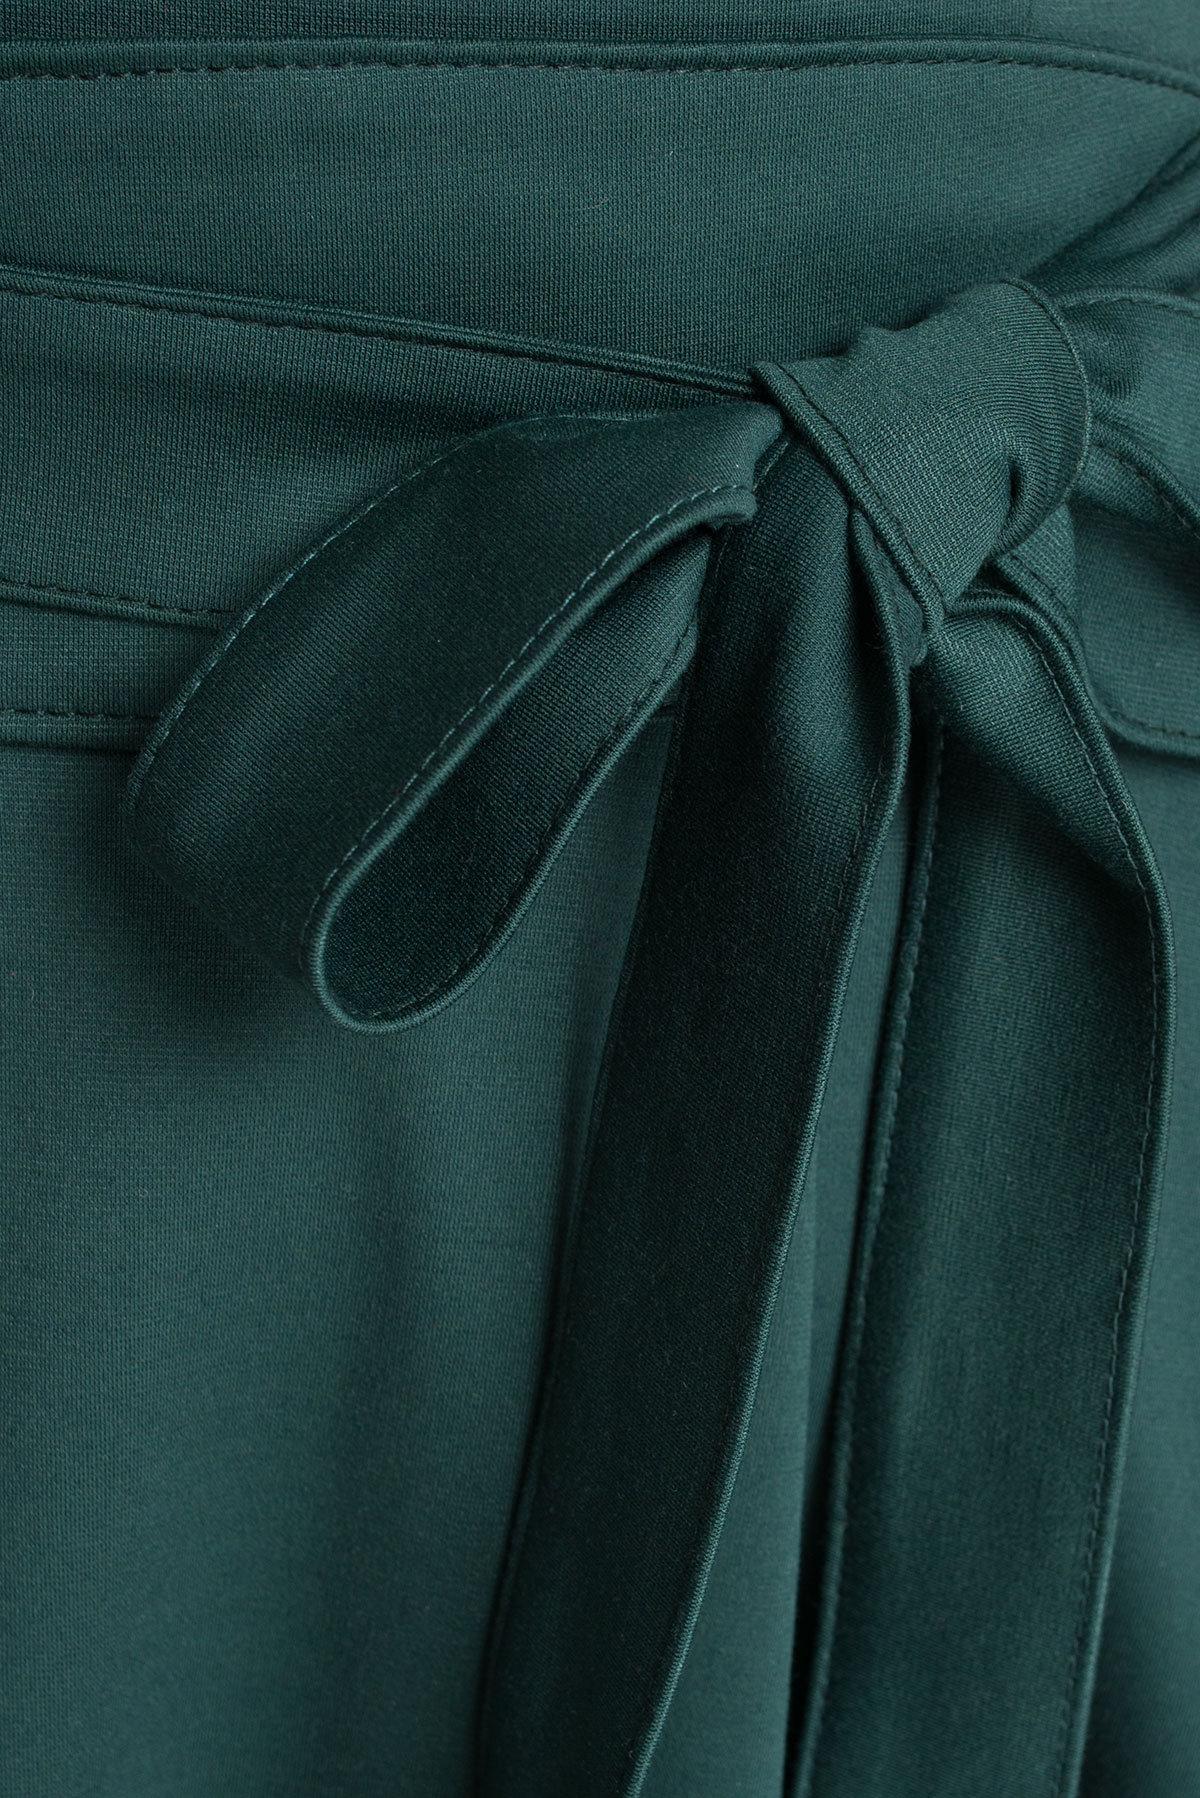 Платье Карен 3866 Цвет: Зеленый